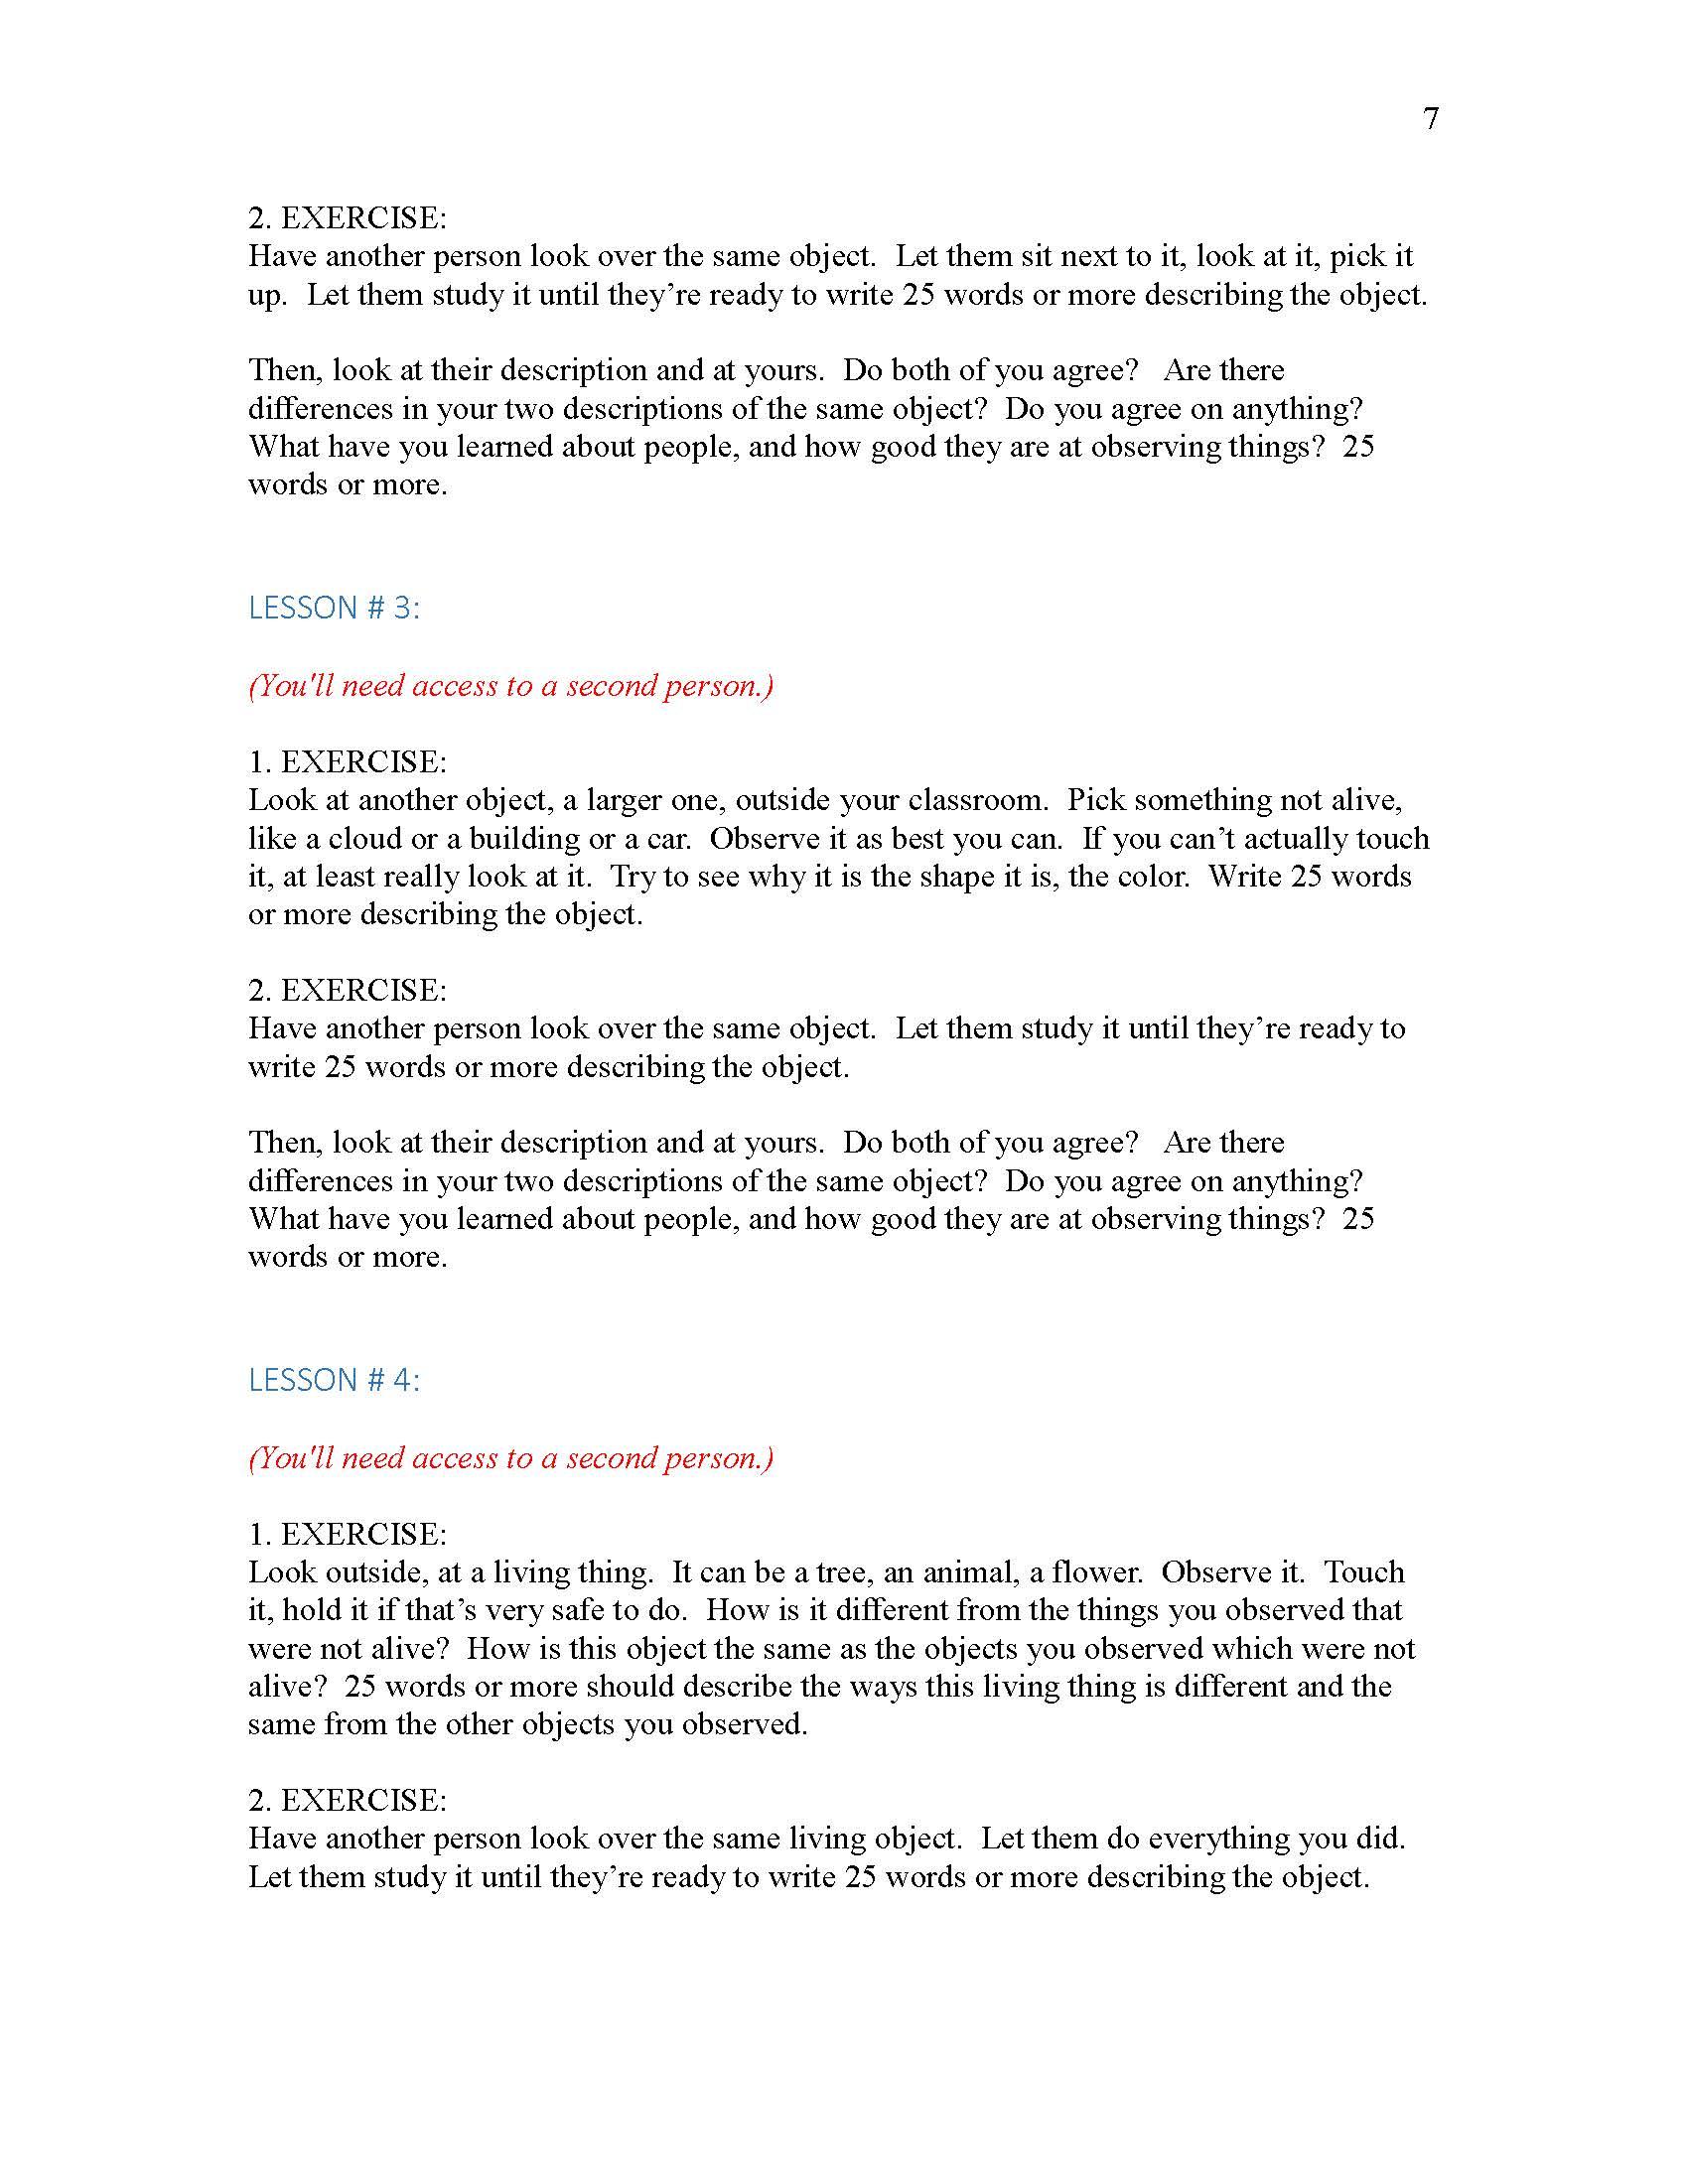 Samples Step 3 Science 1 - Science Basics_Page_08.jpg